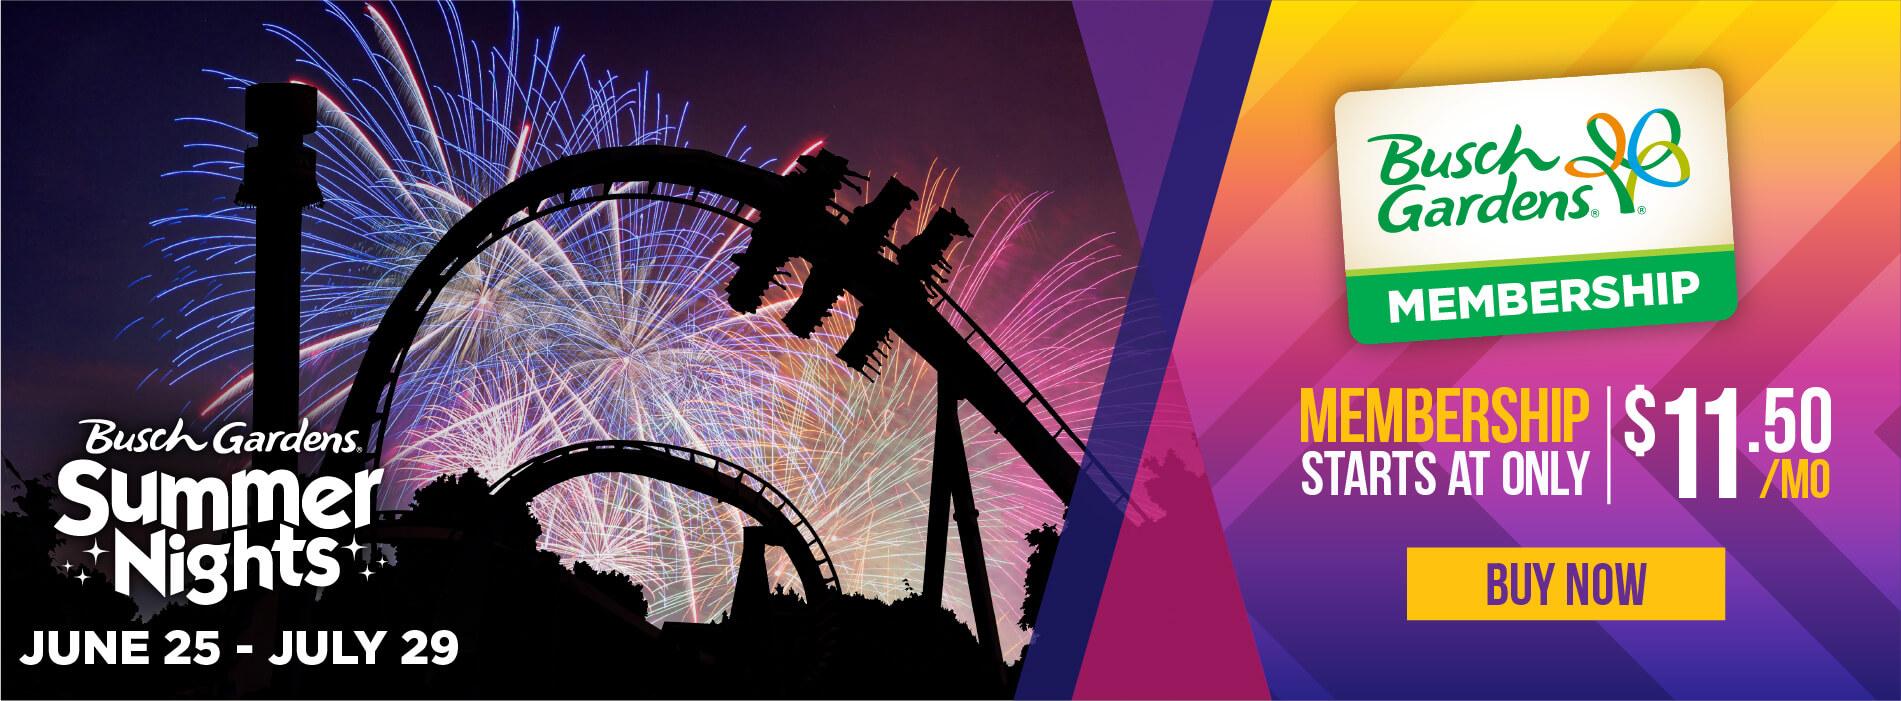 Busch Gardens Williamsburg Summer Nights Membership